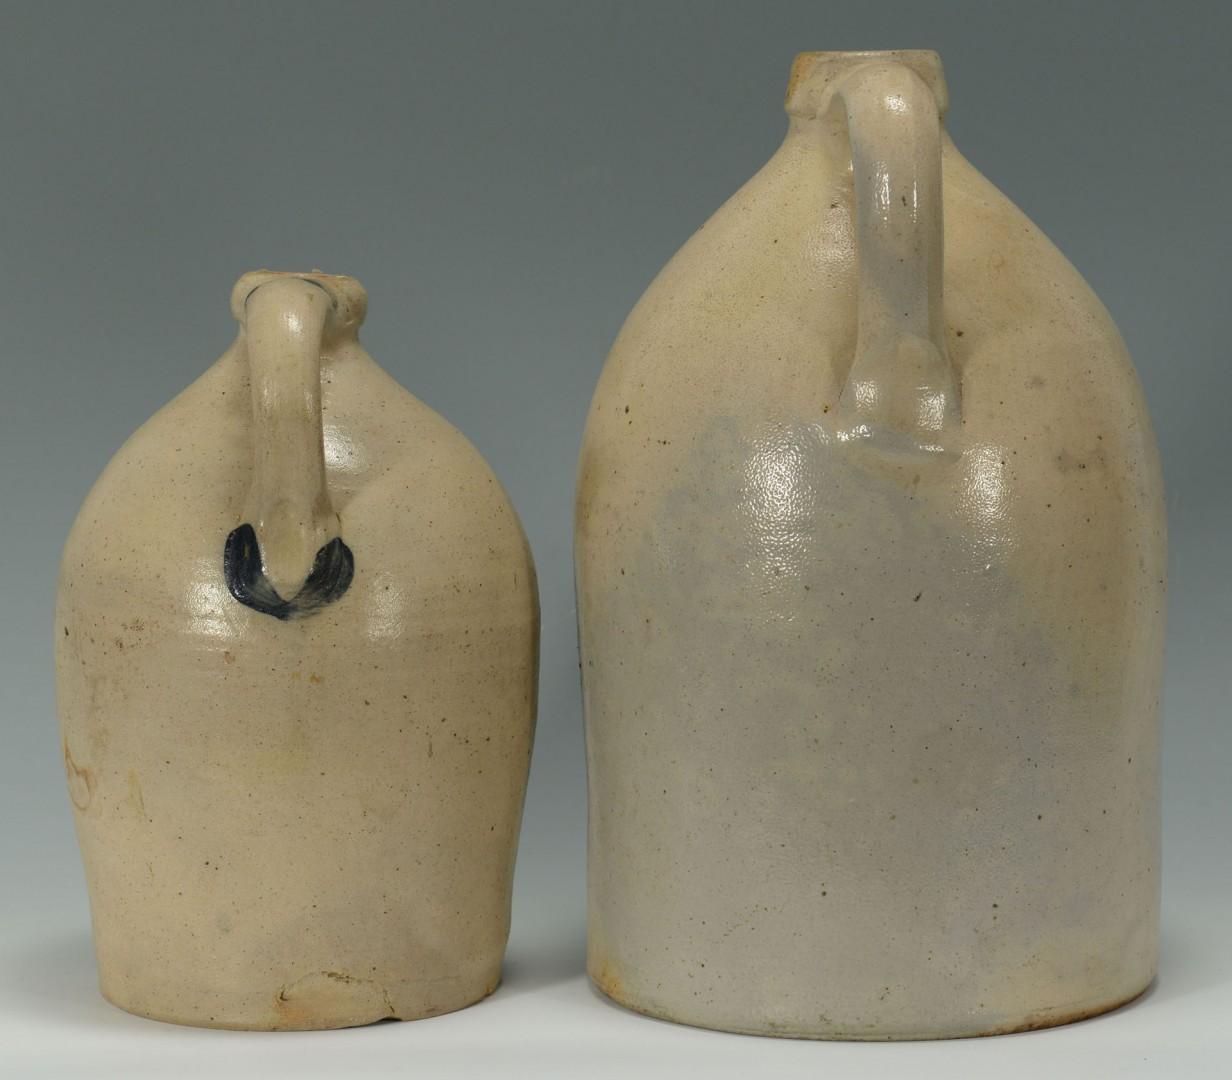 2 Cobalt Decorated Stoneware Jugs, New England